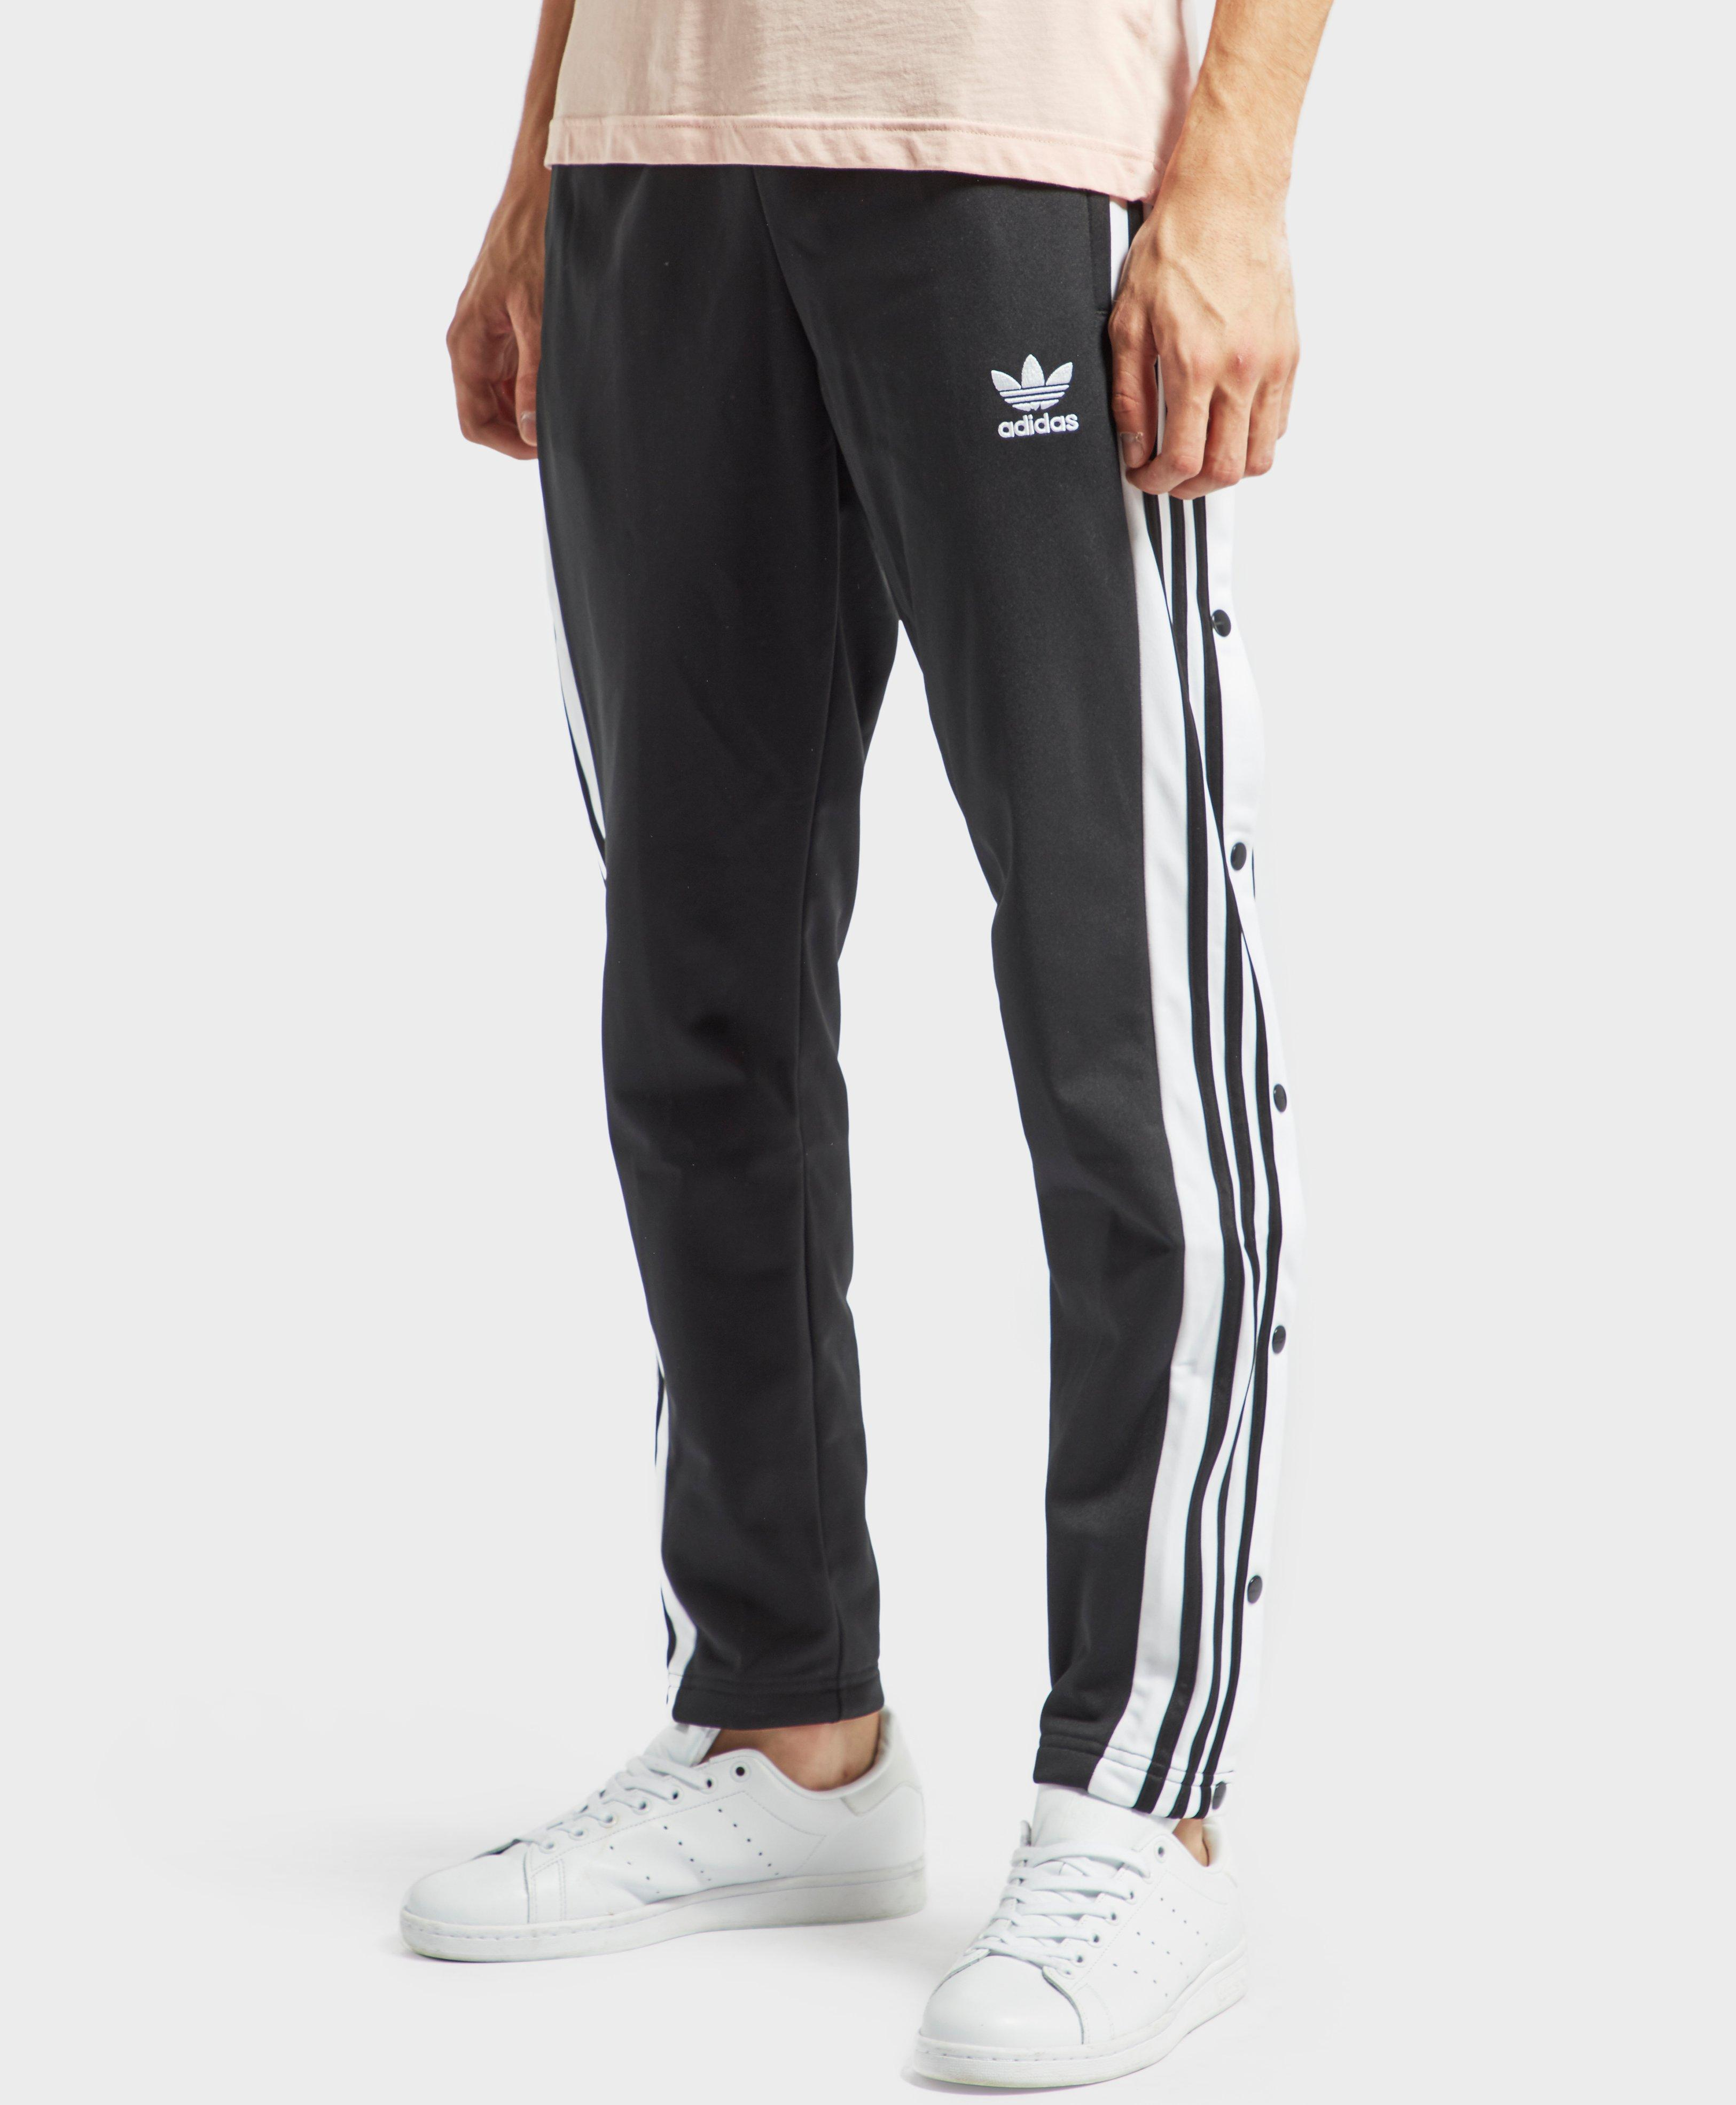 adidas original trousers